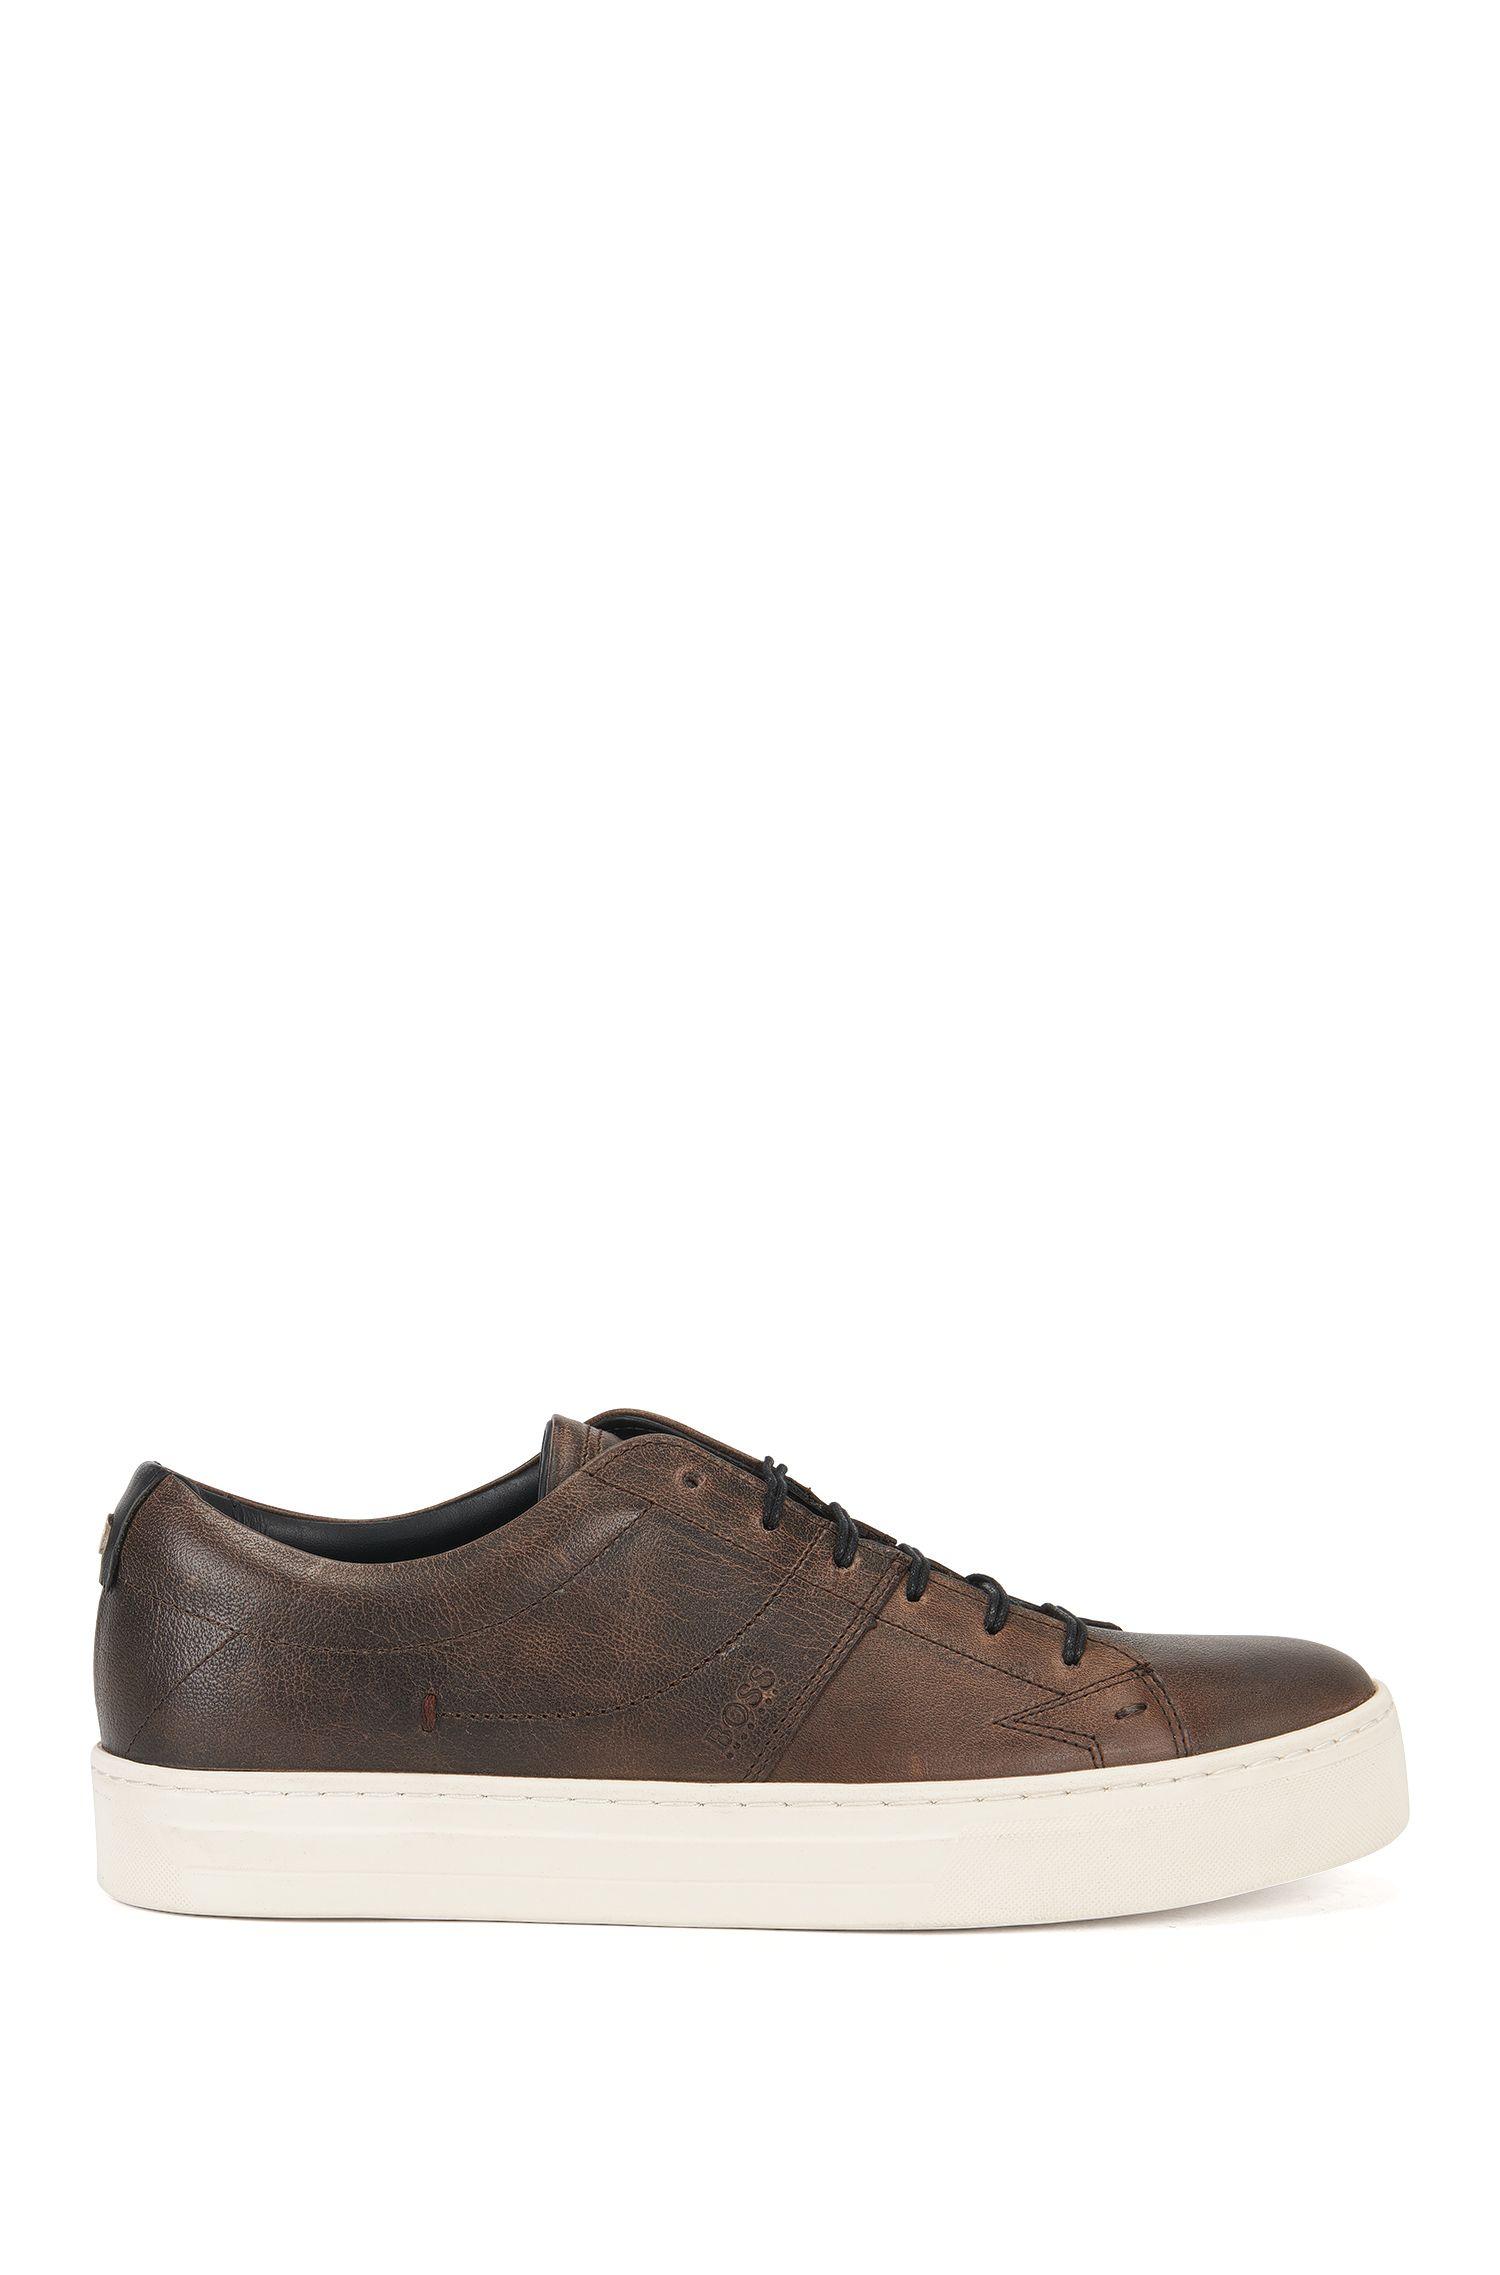 Leather Tennis Shoe | Noir Tenn Pp